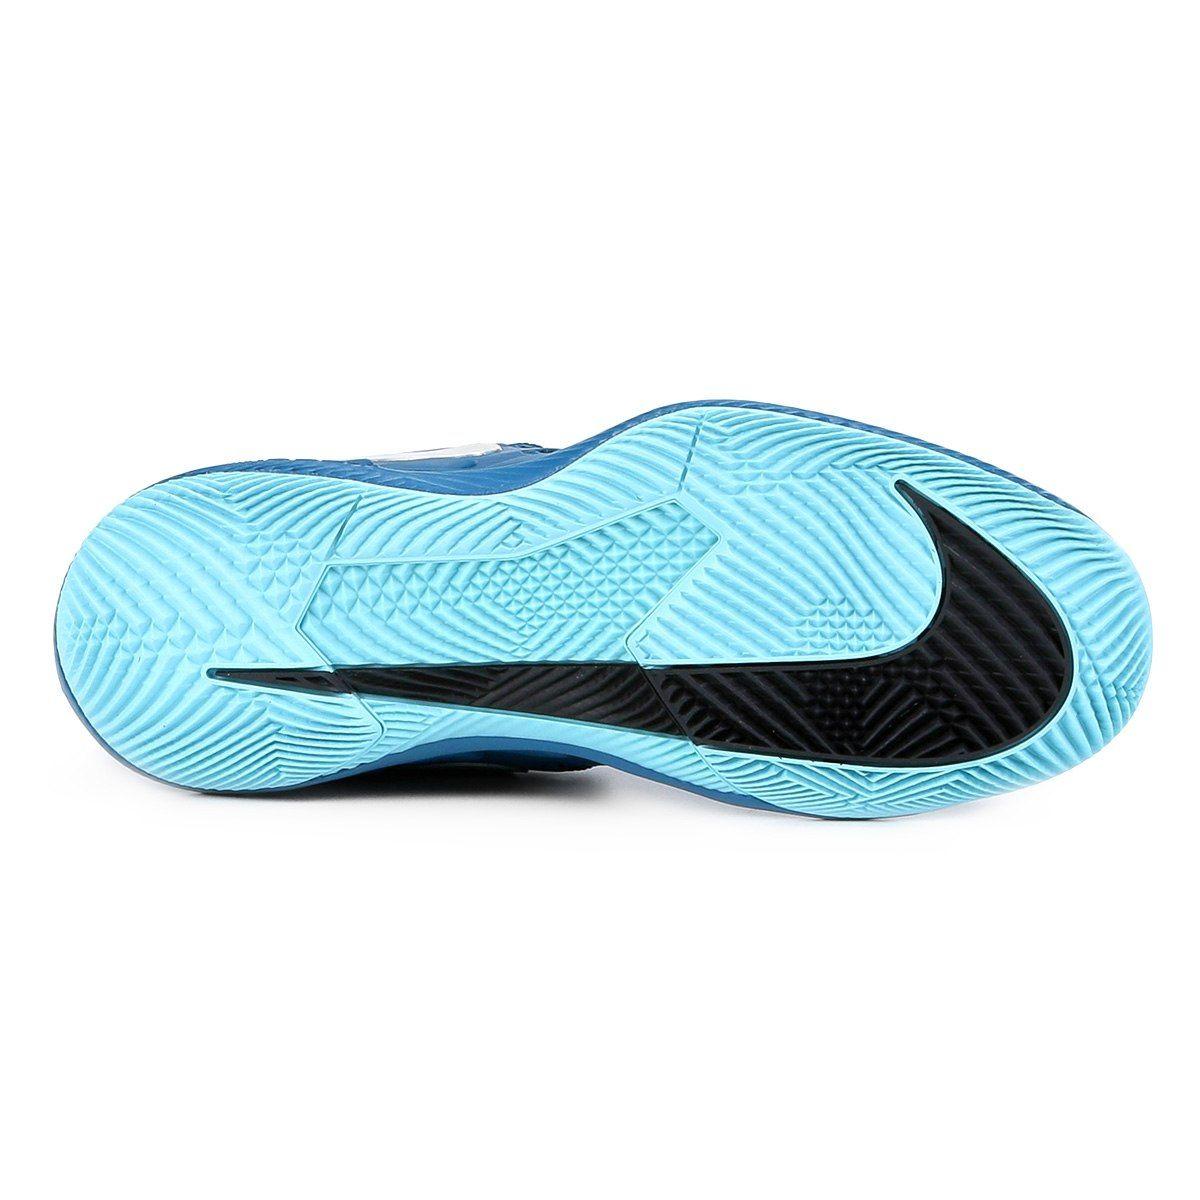 Tênis Nike Air Zoom Vapor X Masculino - Roger Federer